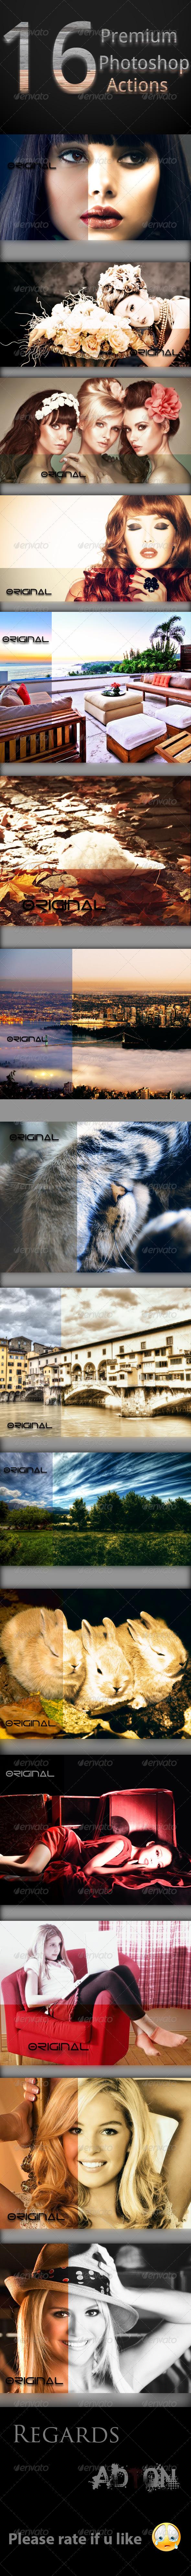 GraphicRiver 16 Premium Photoshop Actions 7991530